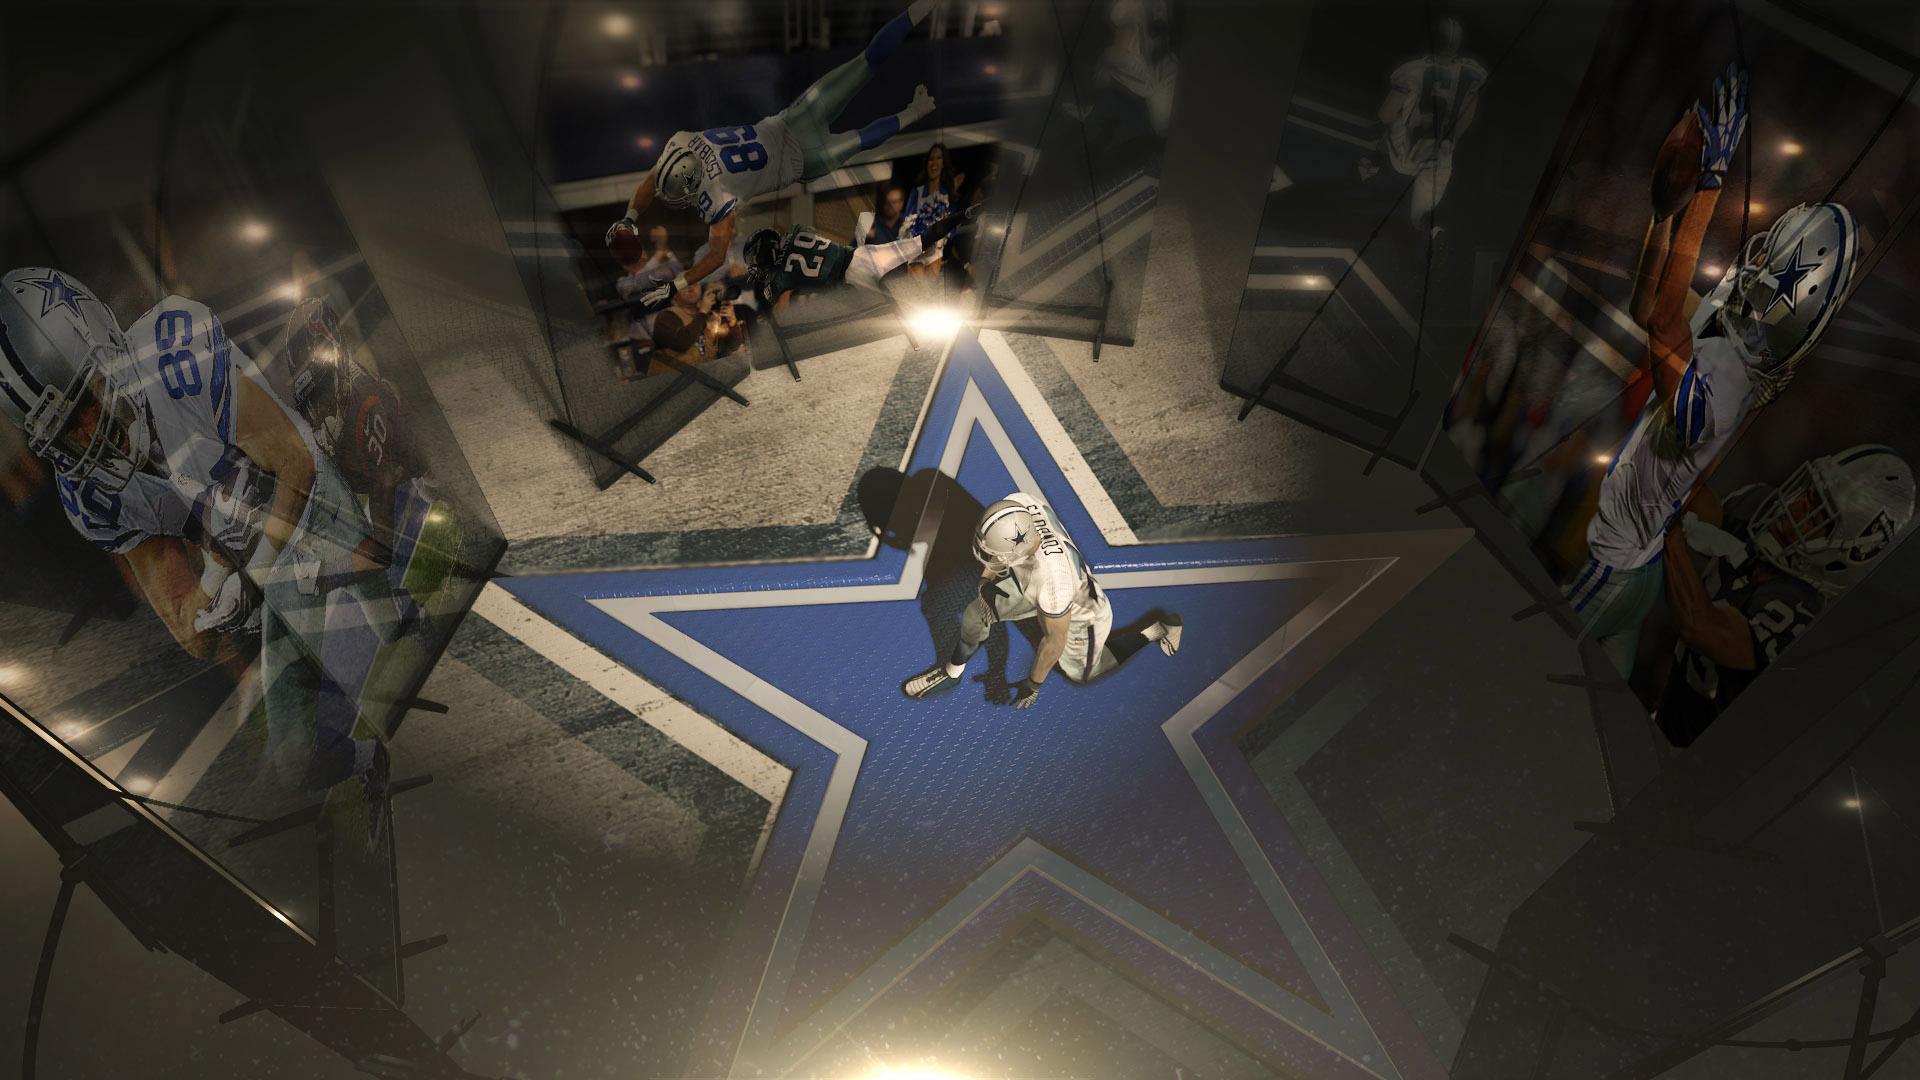 Dallas-Cowboys-Free-Download-wallpaper-wp3604545